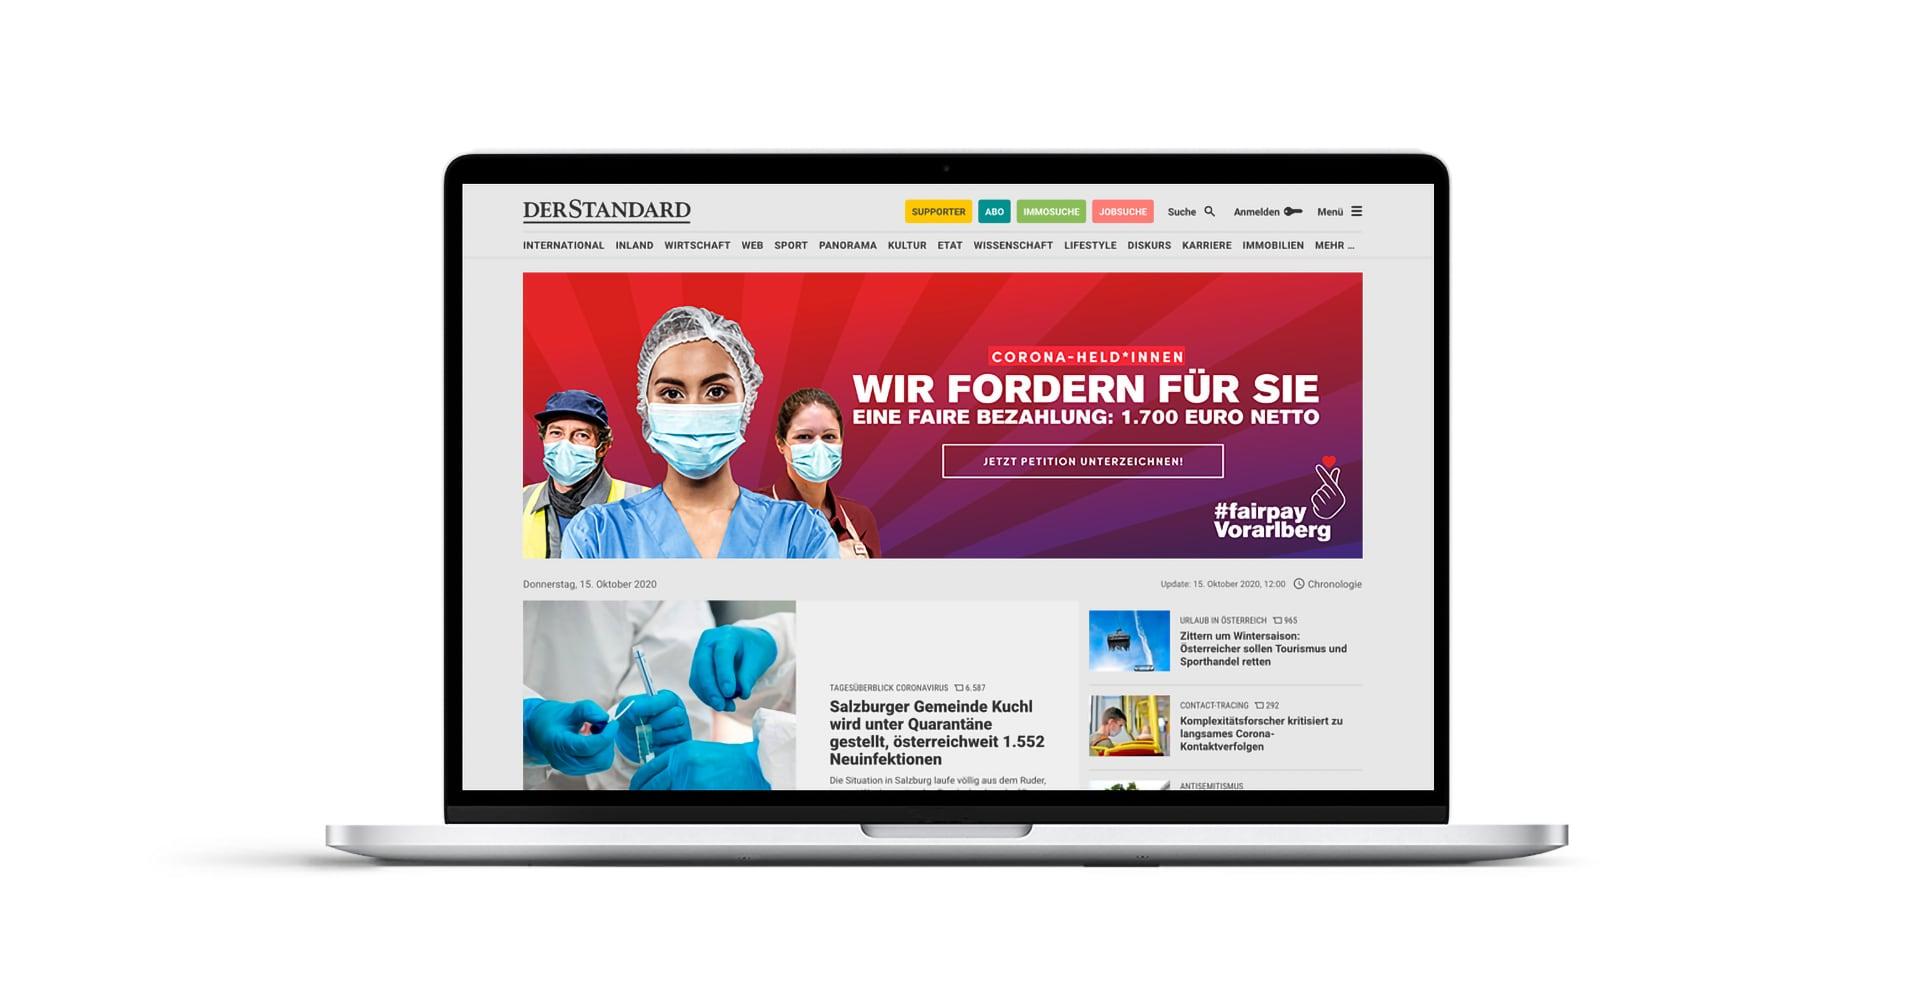 Kampagenenwebsite #fairpay Vorarberg